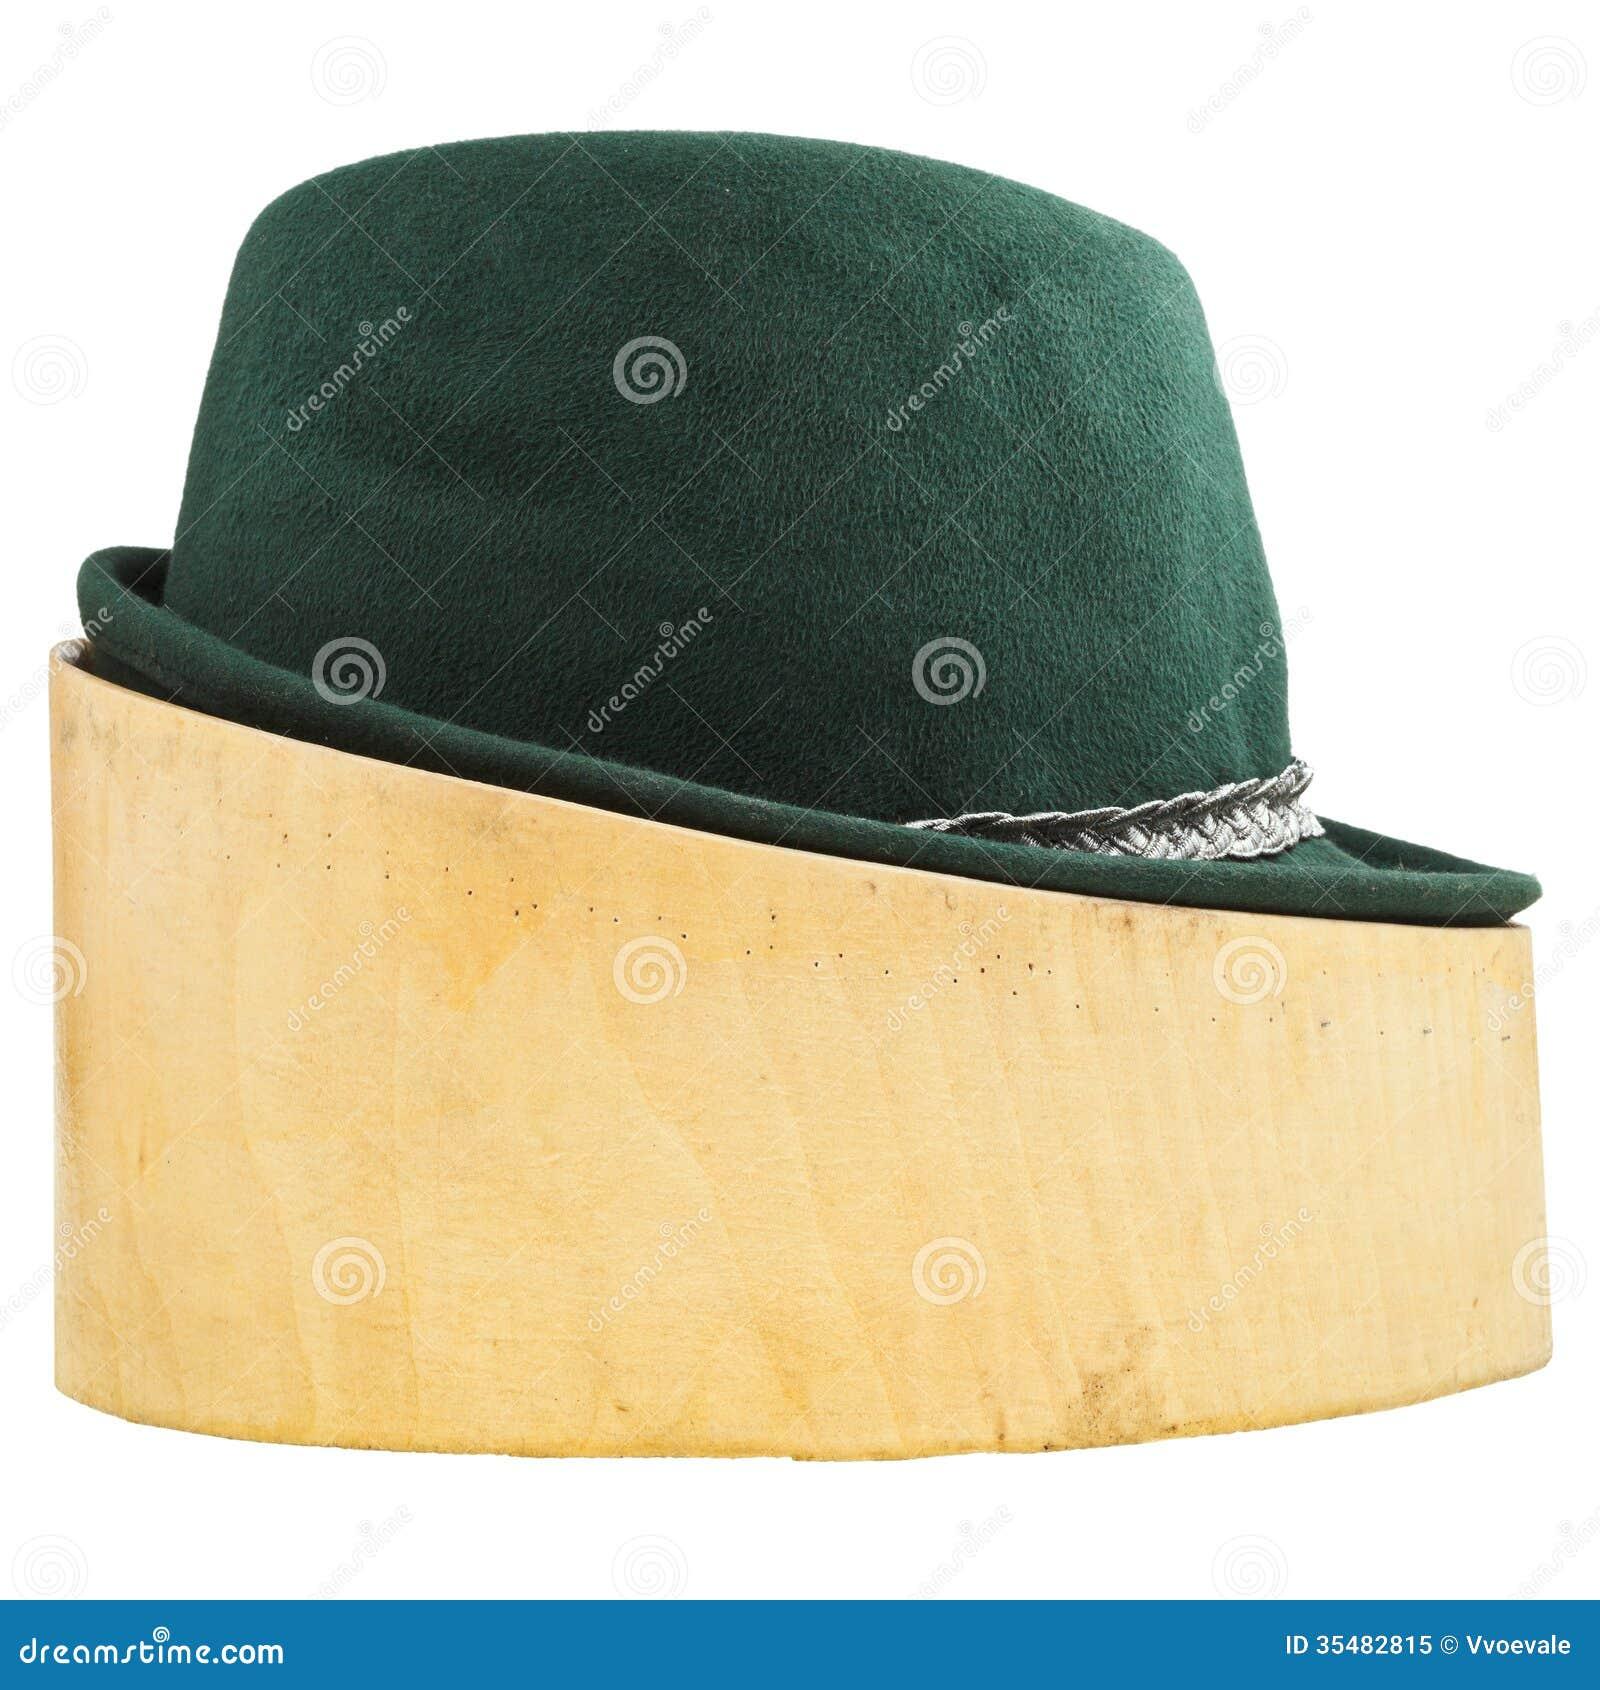 Sombrero De Fieltro Tirolés Verde En El Bloque De Madera Del Tilo ... 9717774fa8b2